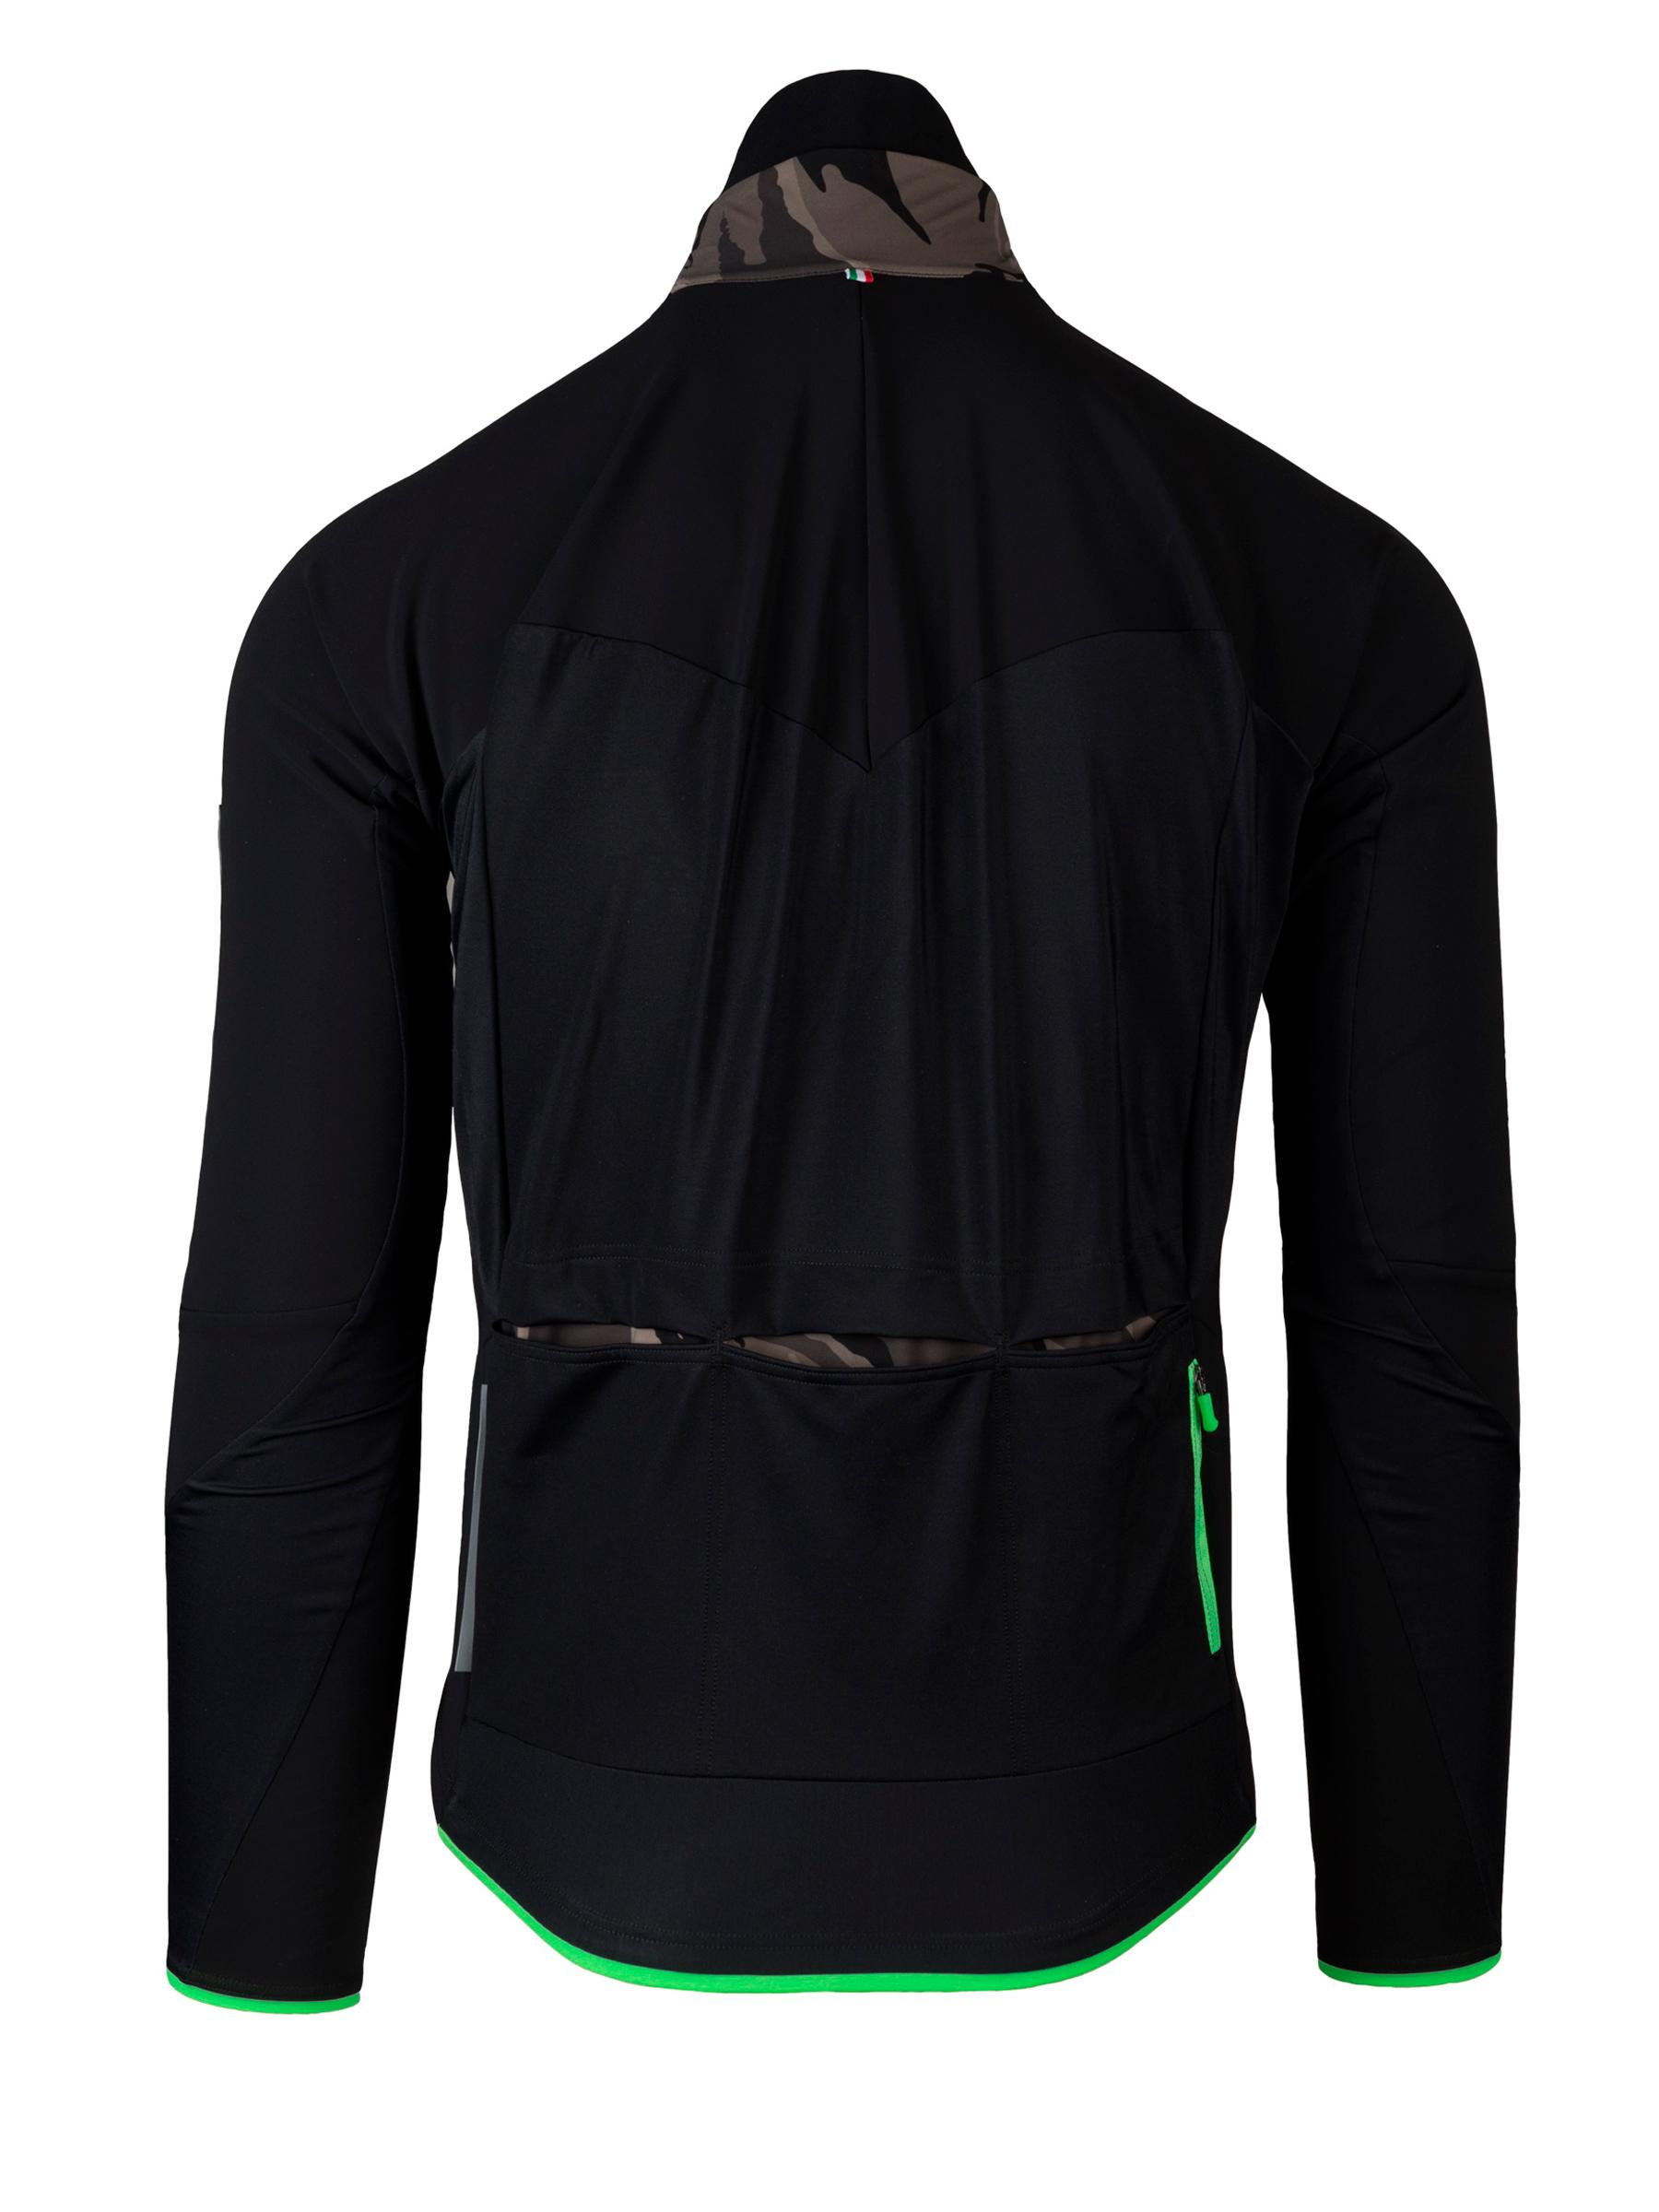 Termica Jacket Black